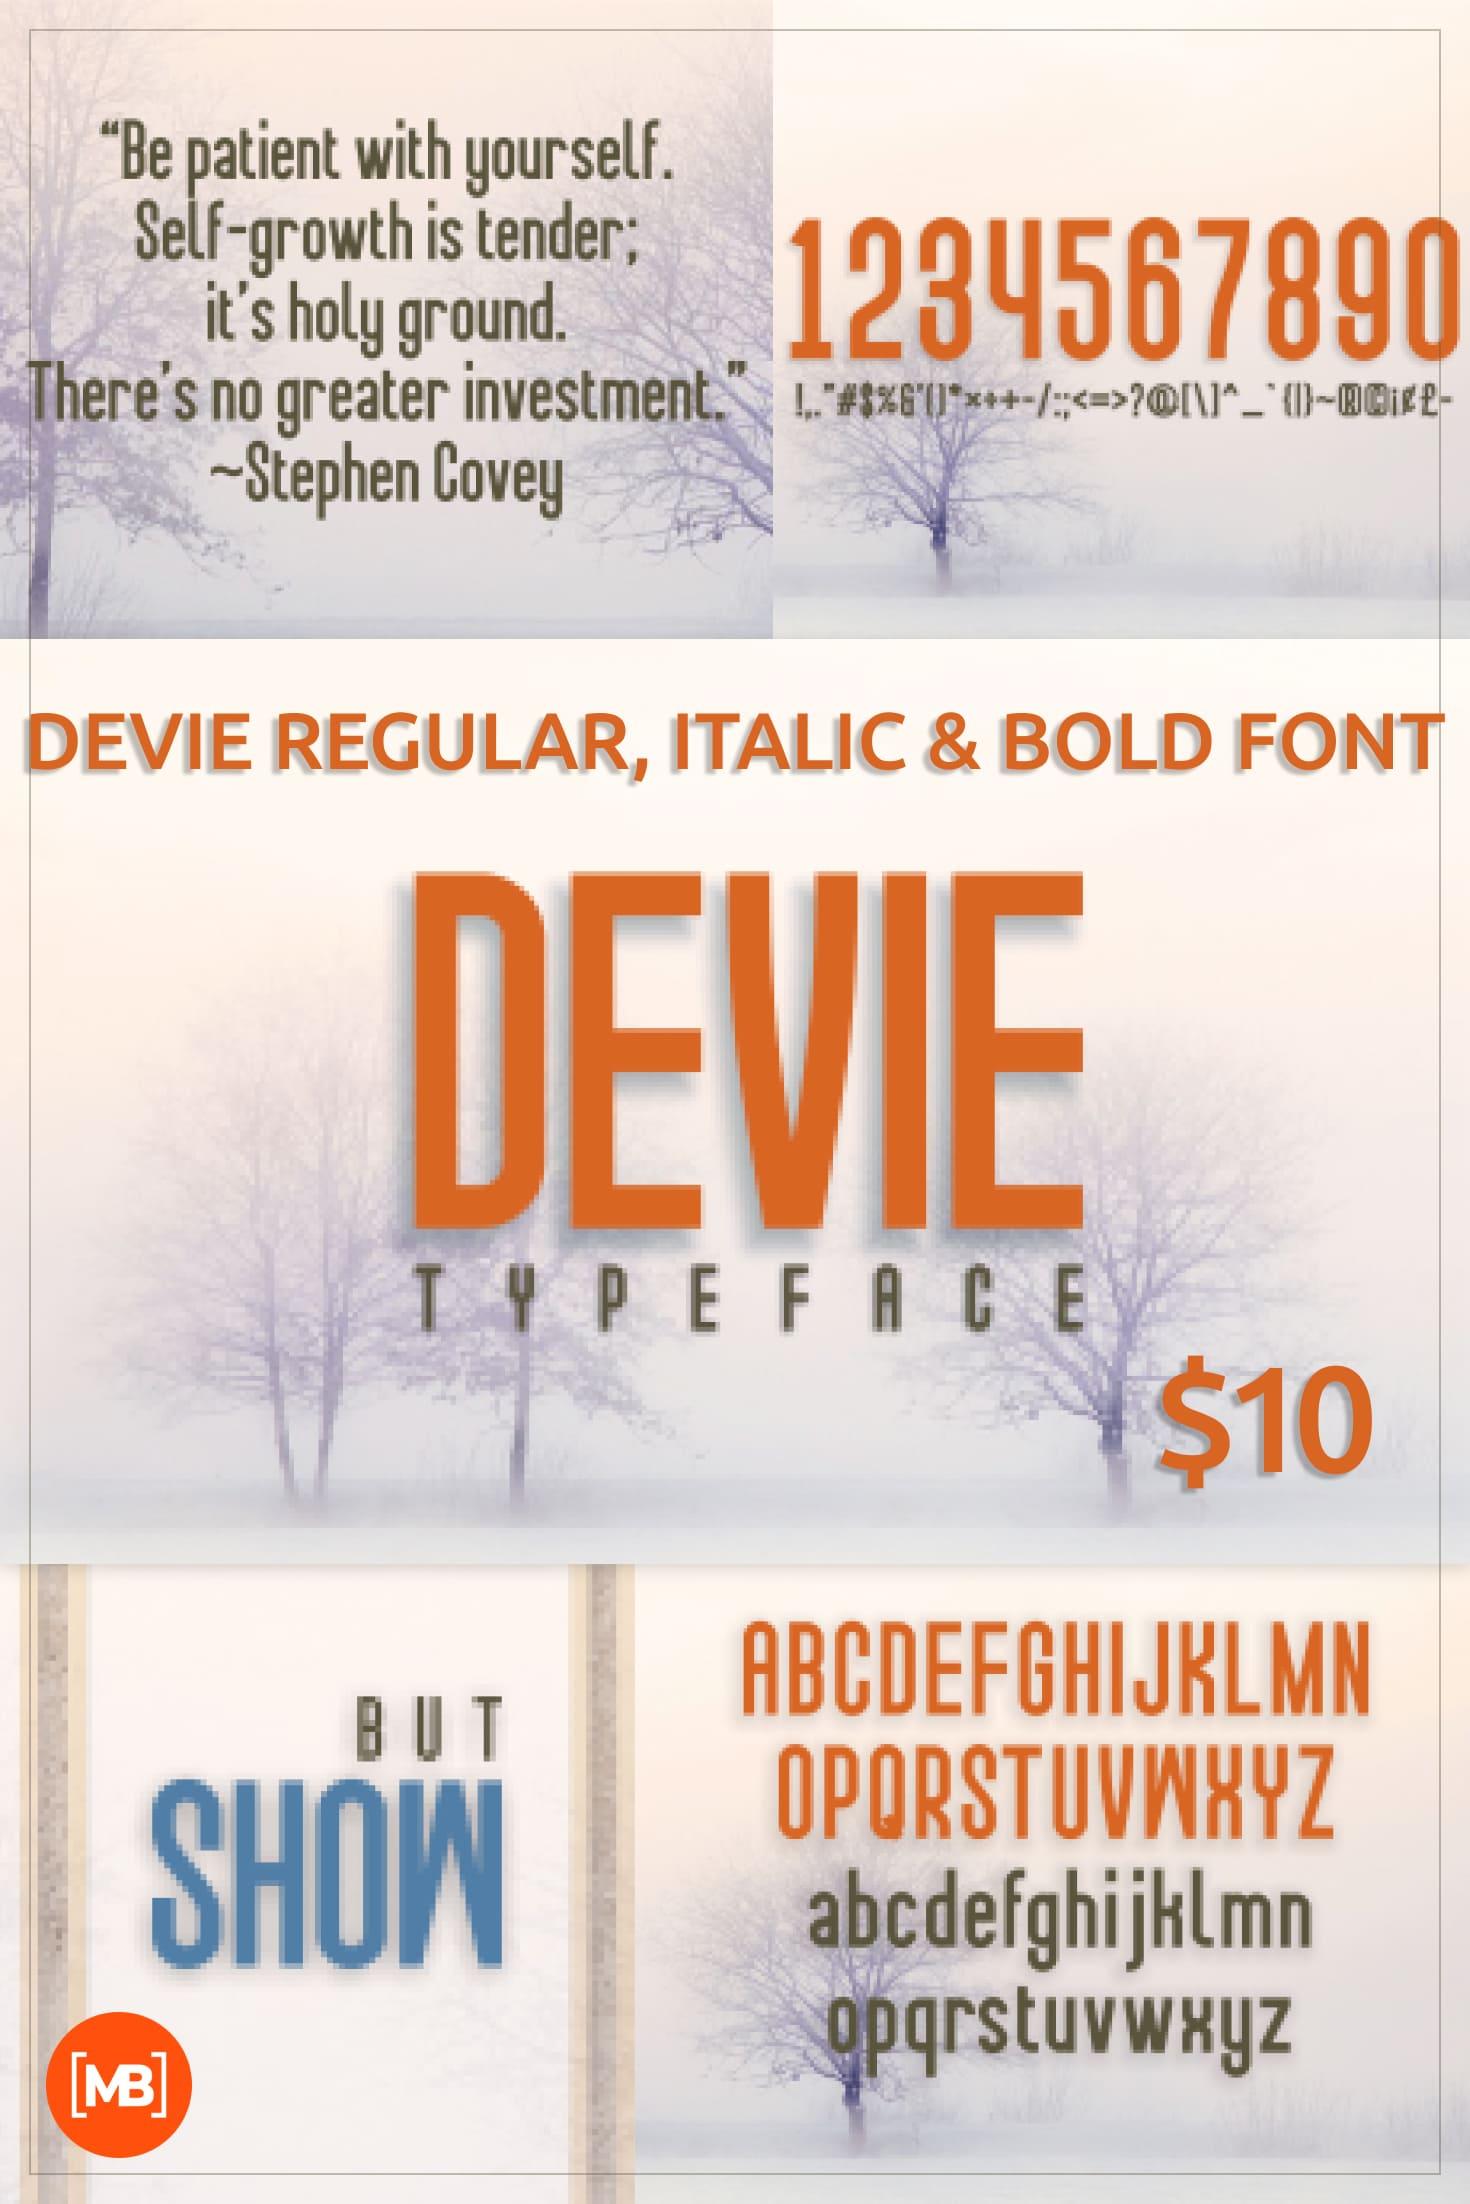 Pinterest Image: Devie Regular, Italic & Bold Font.